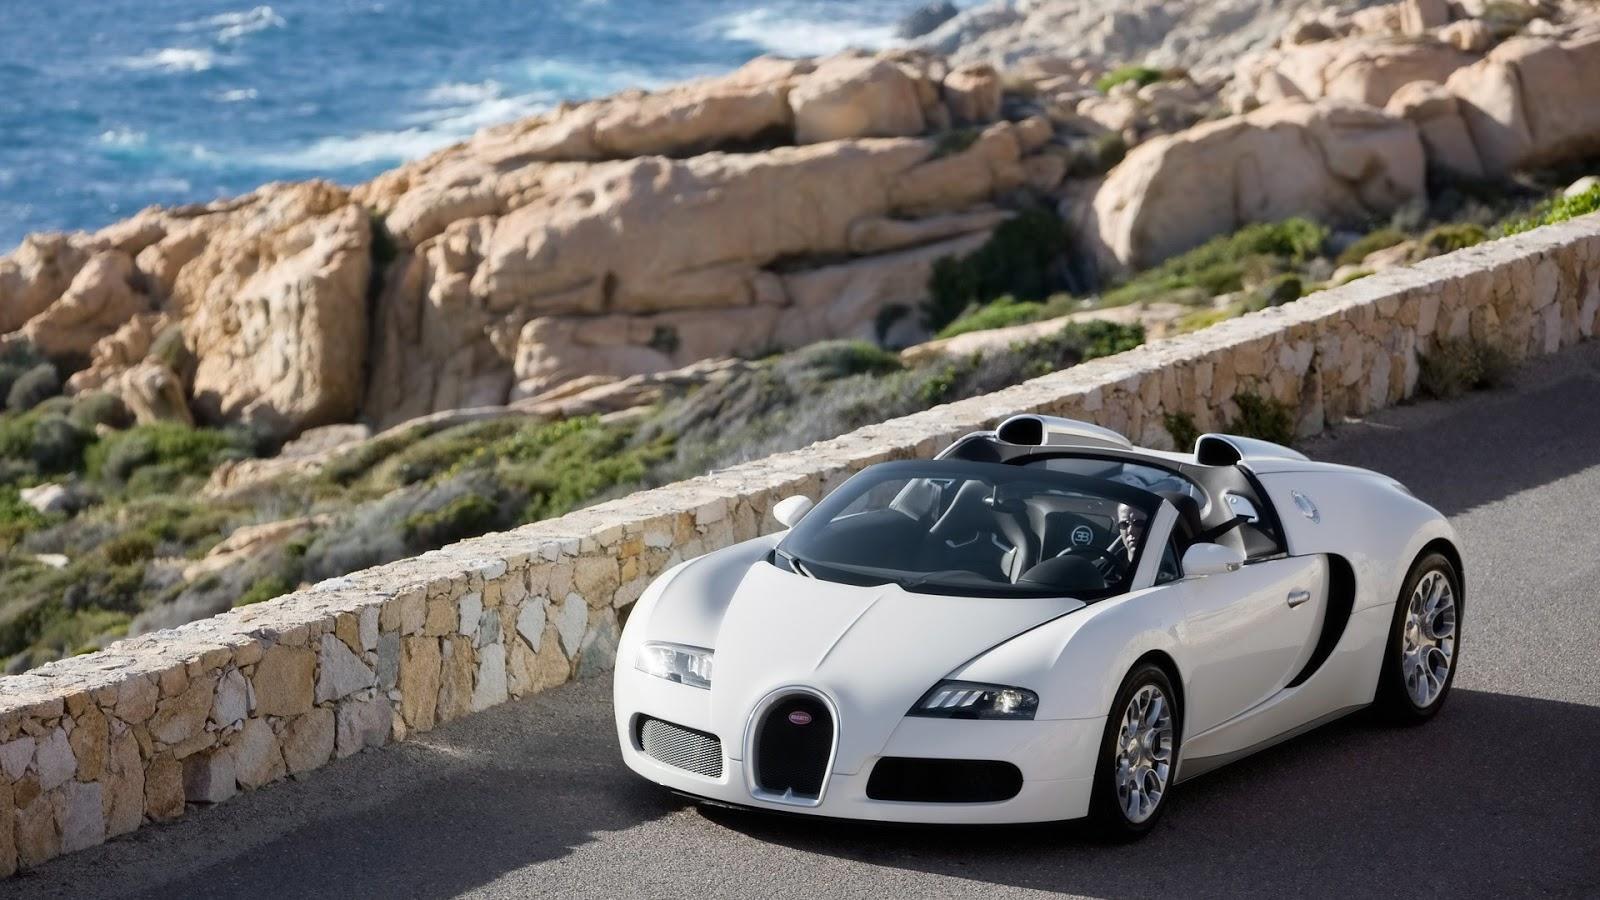 bugatti veyron white cabrio full hd desktop wallpapers 1080p. Black Bedroom Furniture Sets. Home Design Ideas